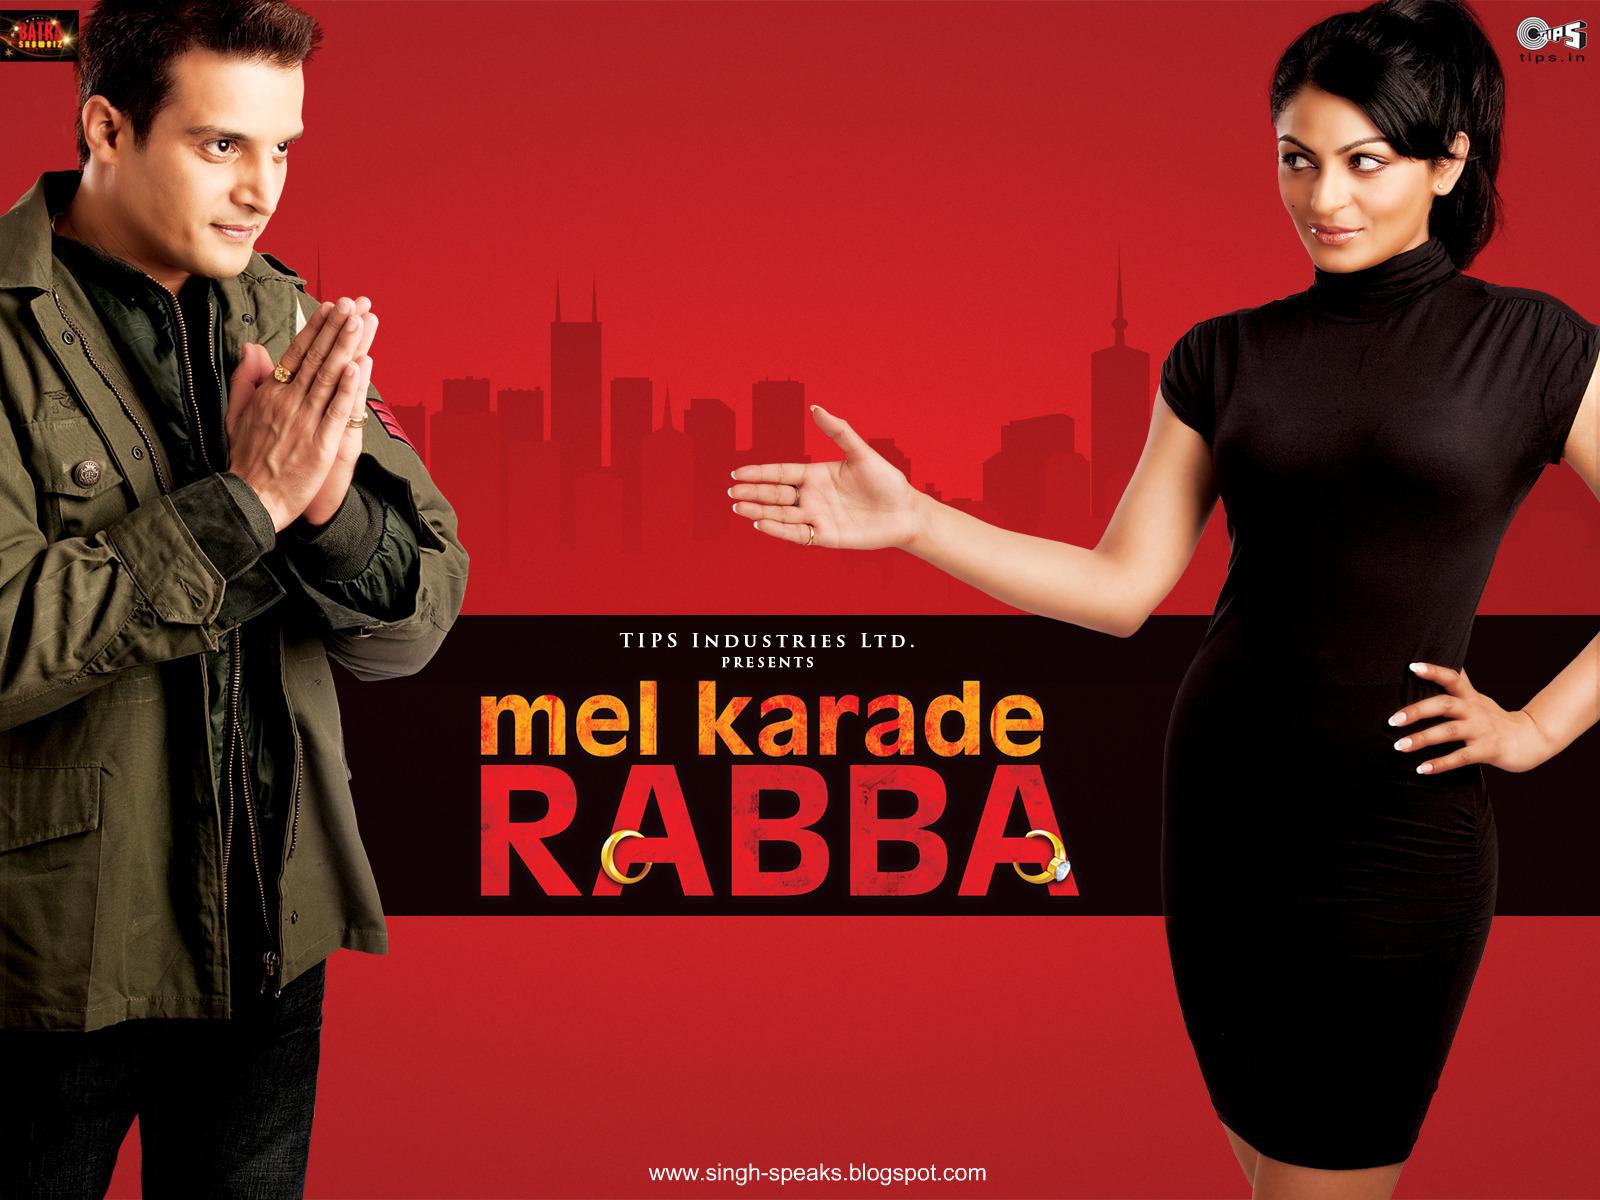 melkrade raba movie songs